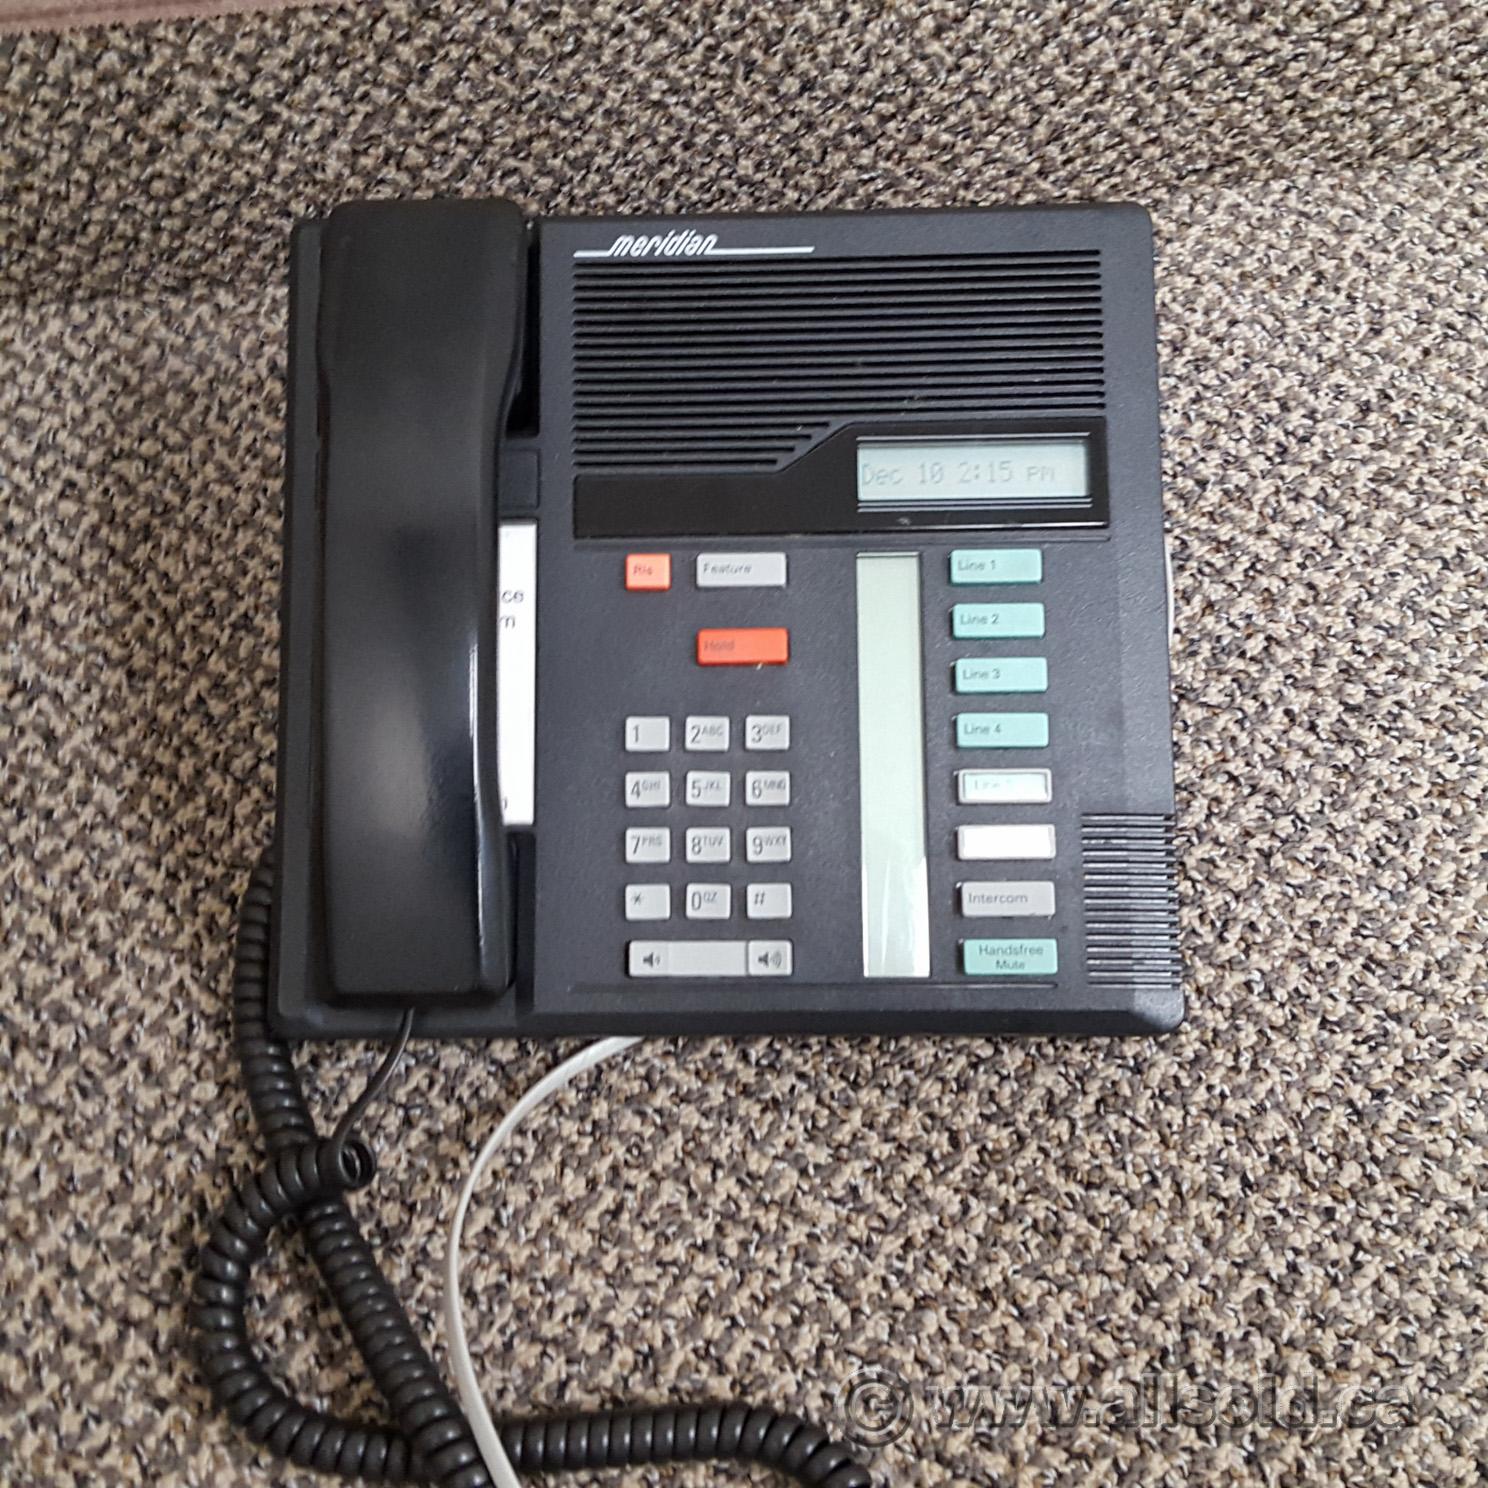 Nortel Meridian M7208 Black Multi Line Business Phone